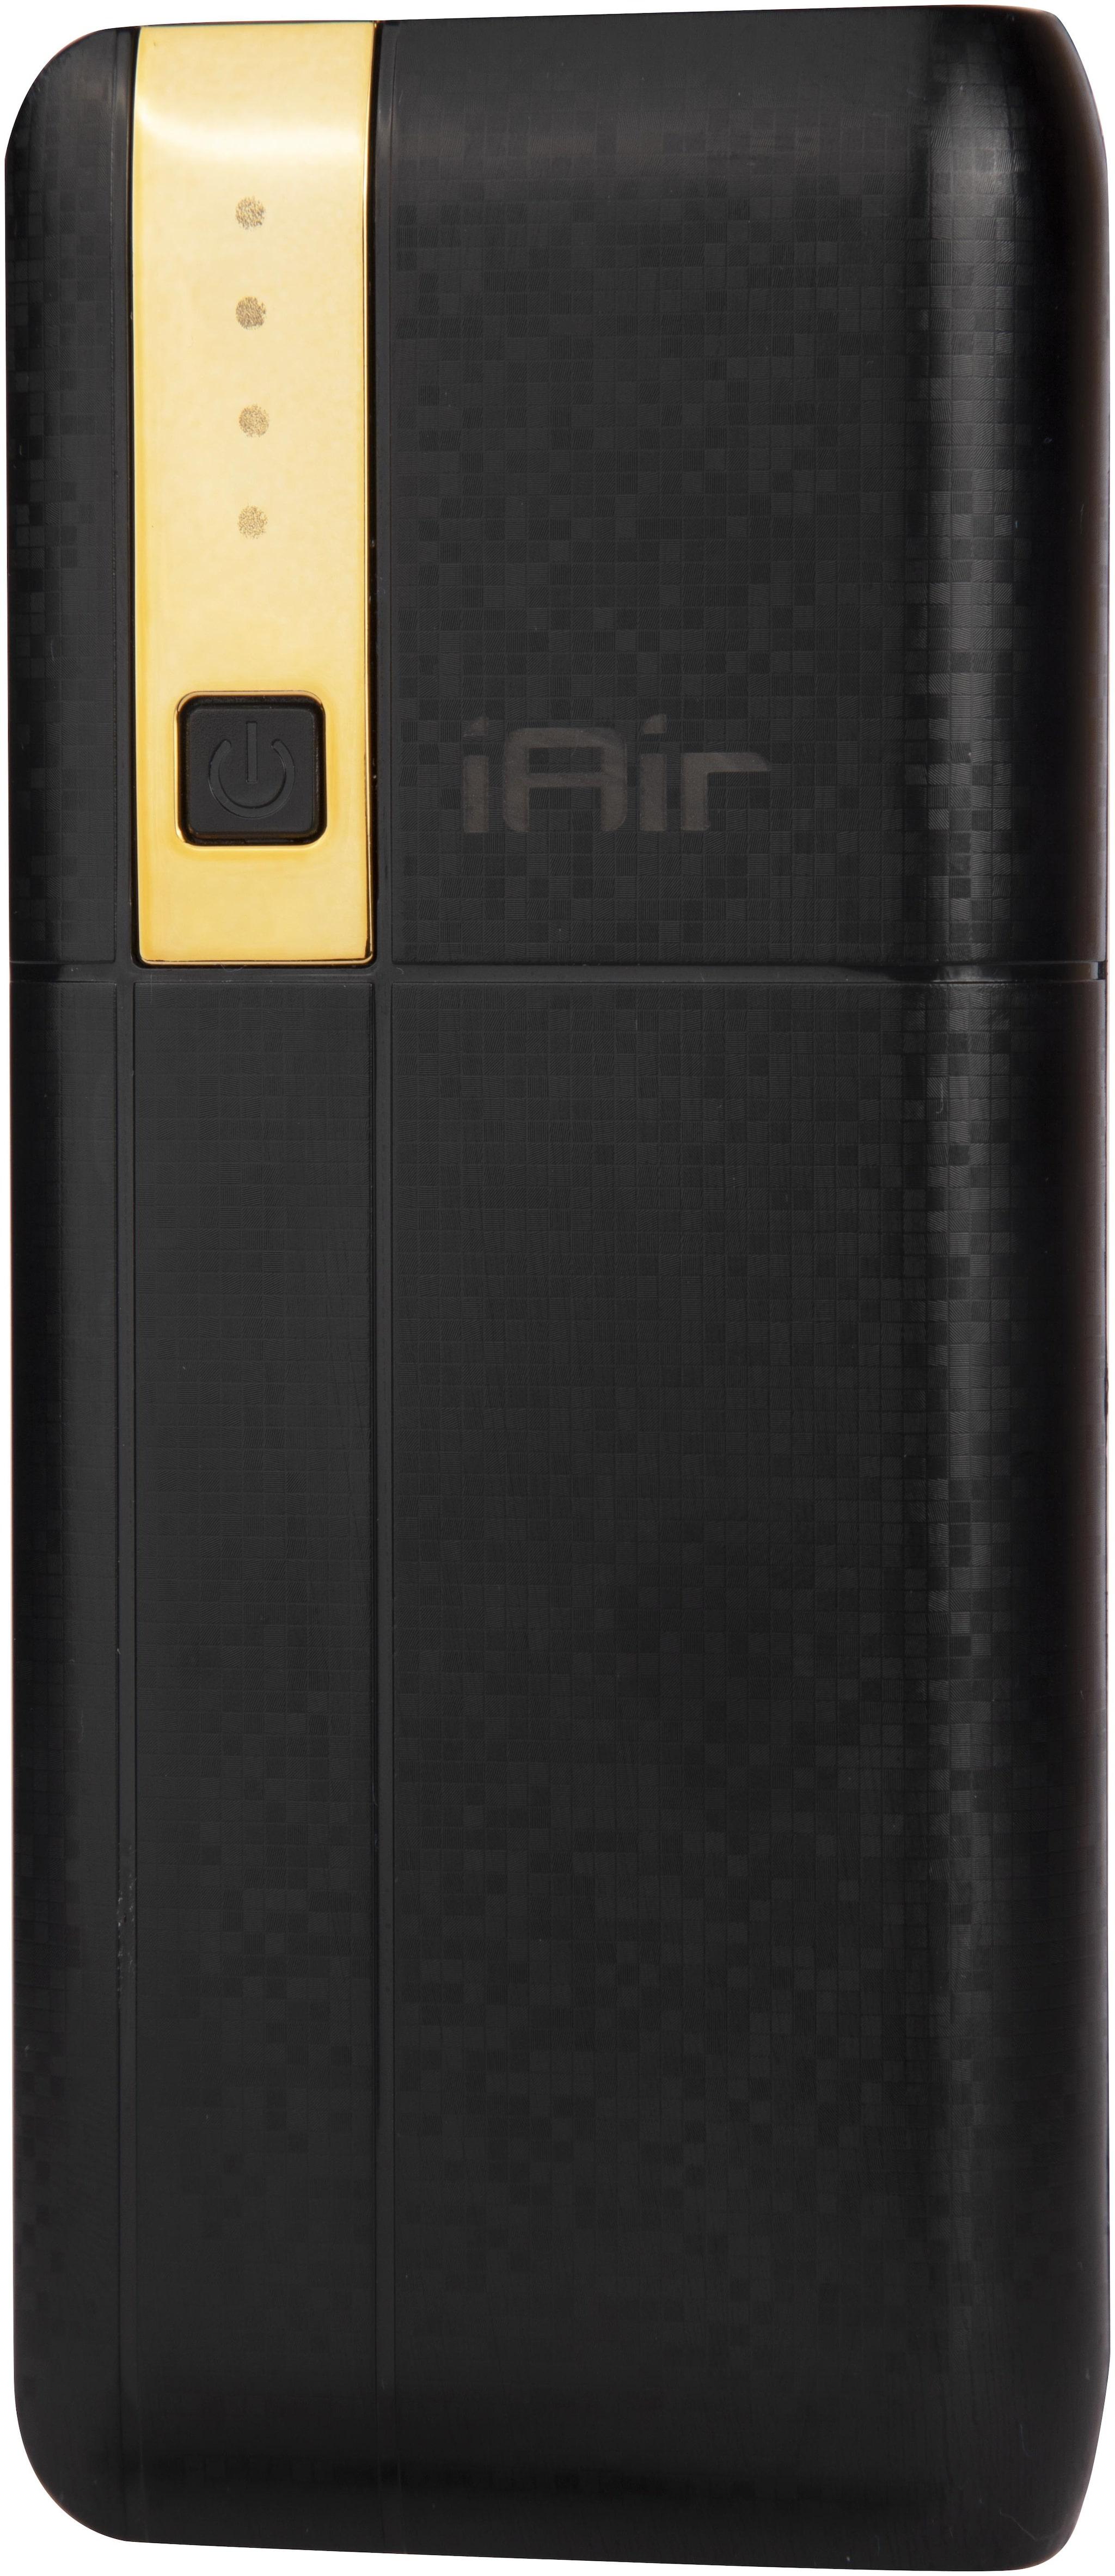 Iair Power Bank 10000 mAh Portable Power Bank   Black